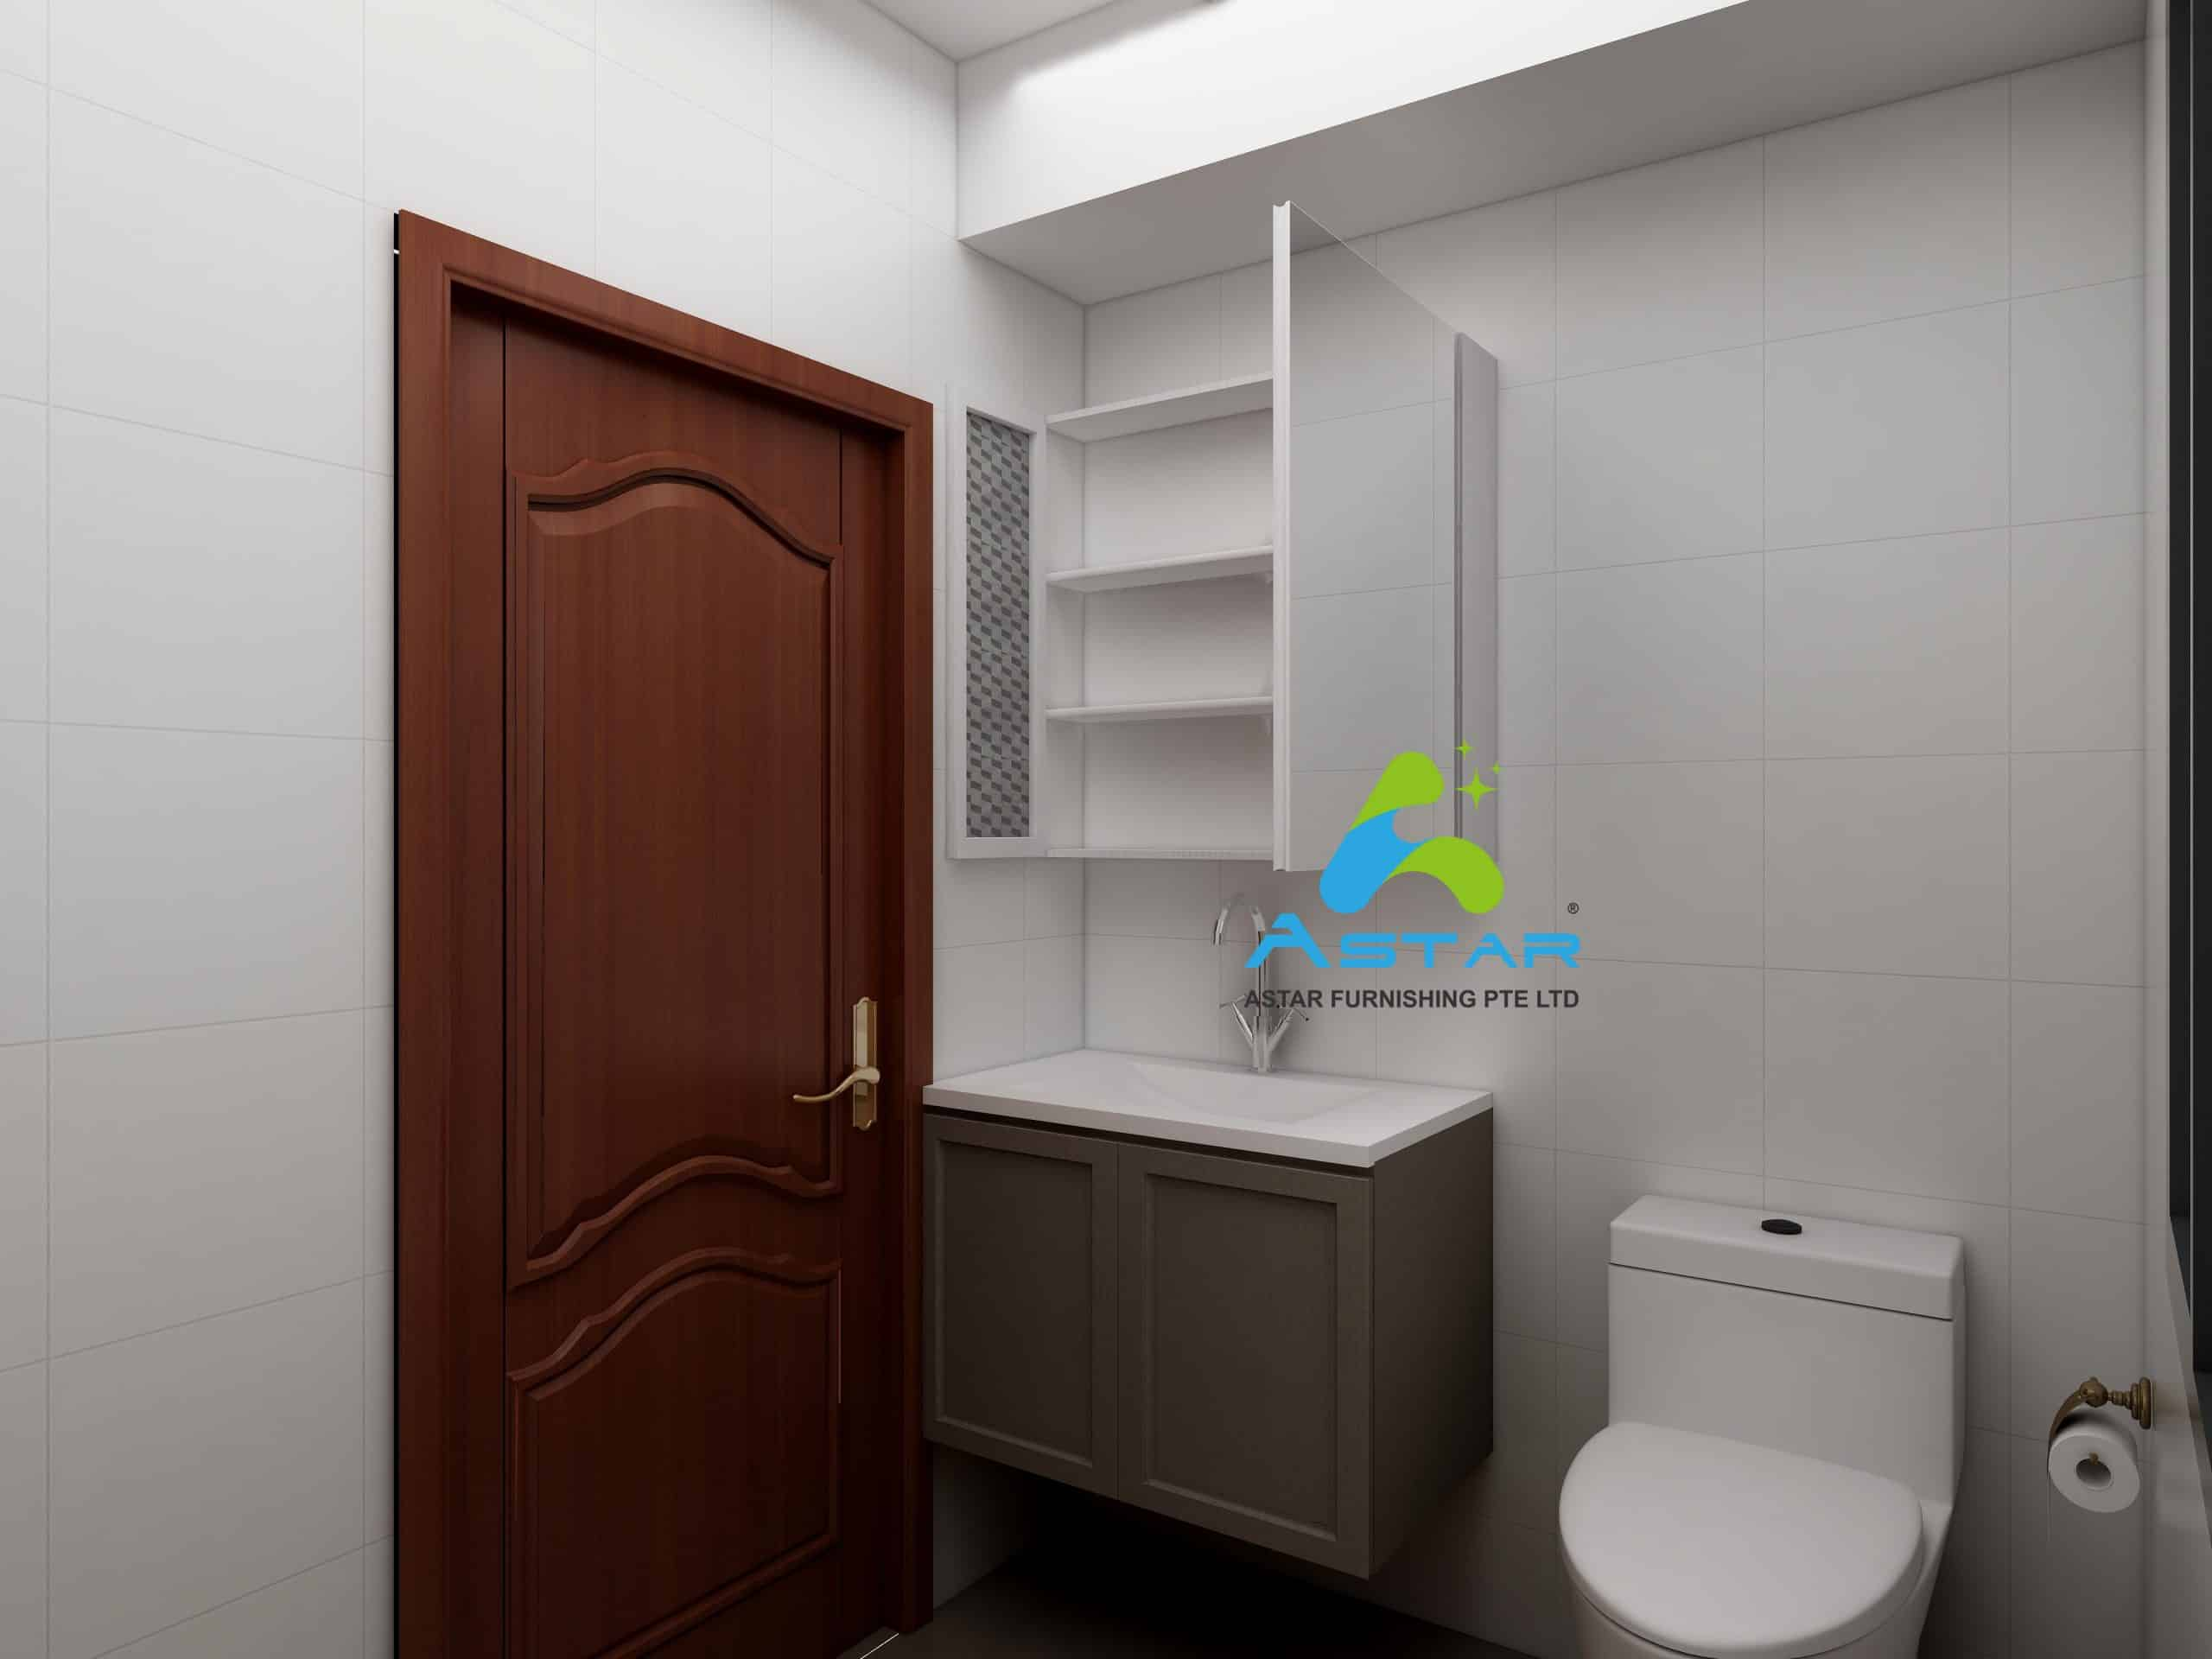 a star furnishing aluminium projects 12. Blk 325B Sumang Walk 060 scaled